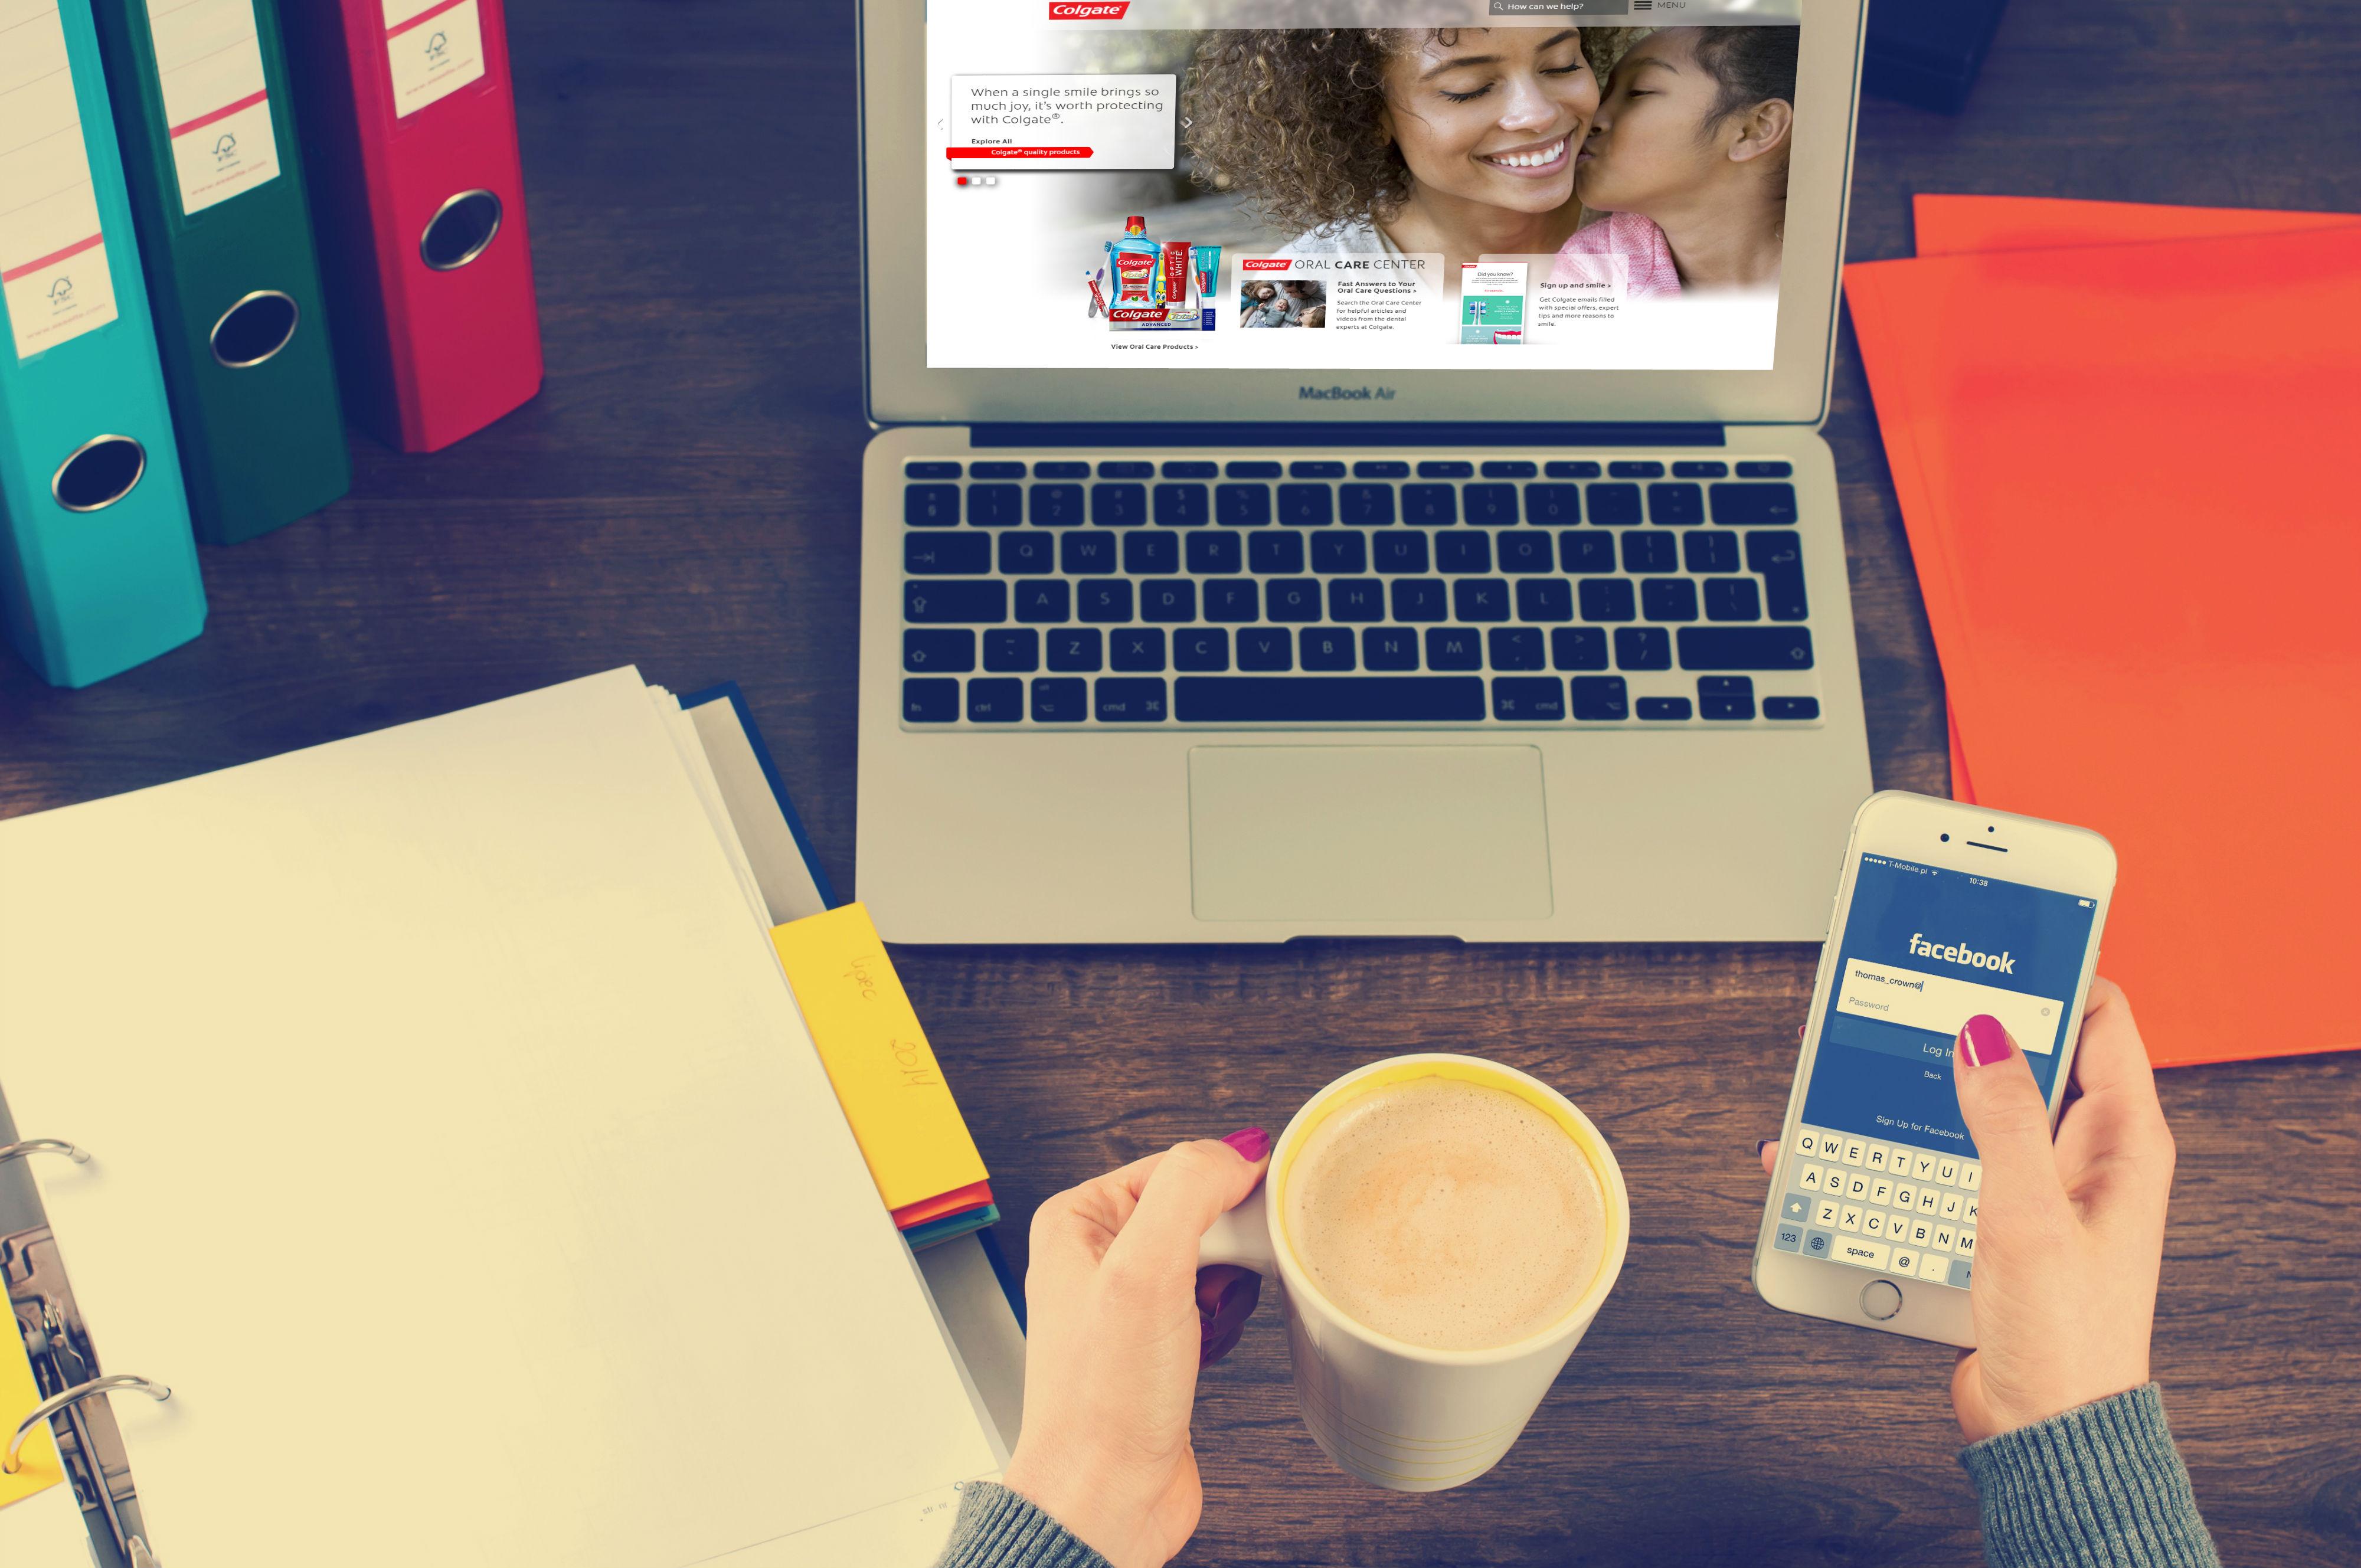 Customer using multiple channels like web and social media